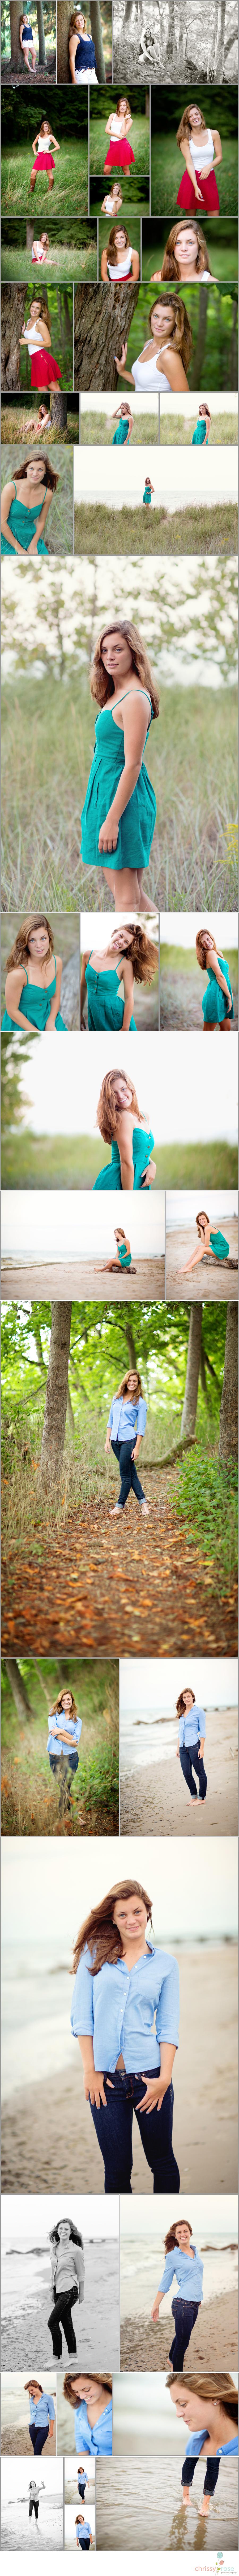 Blog Collage-1351816719908